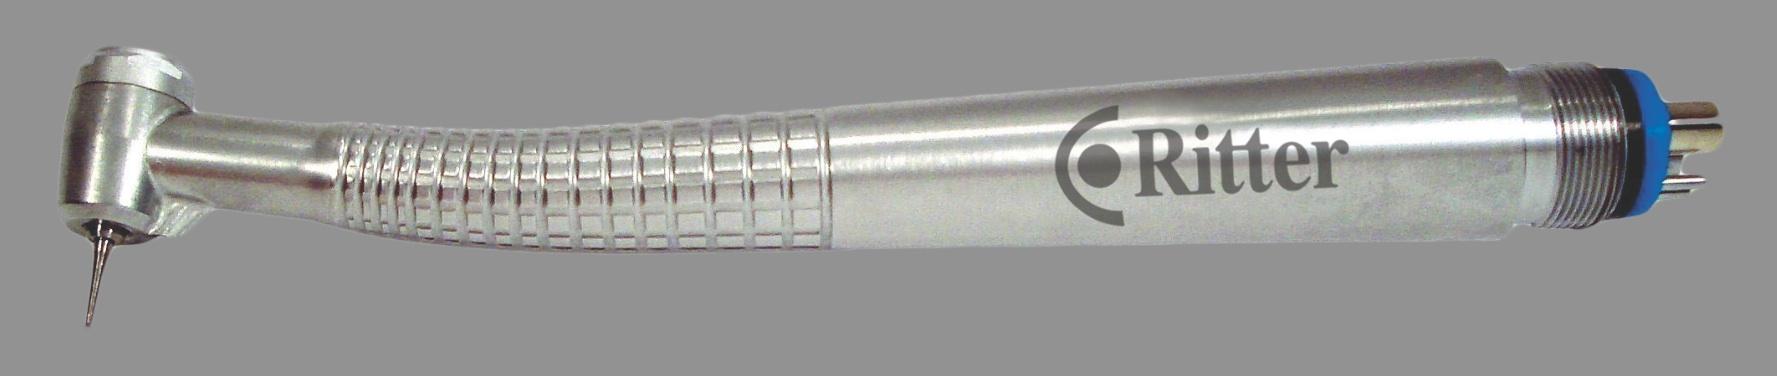 Ritter Dental Expanded Handpiece Line